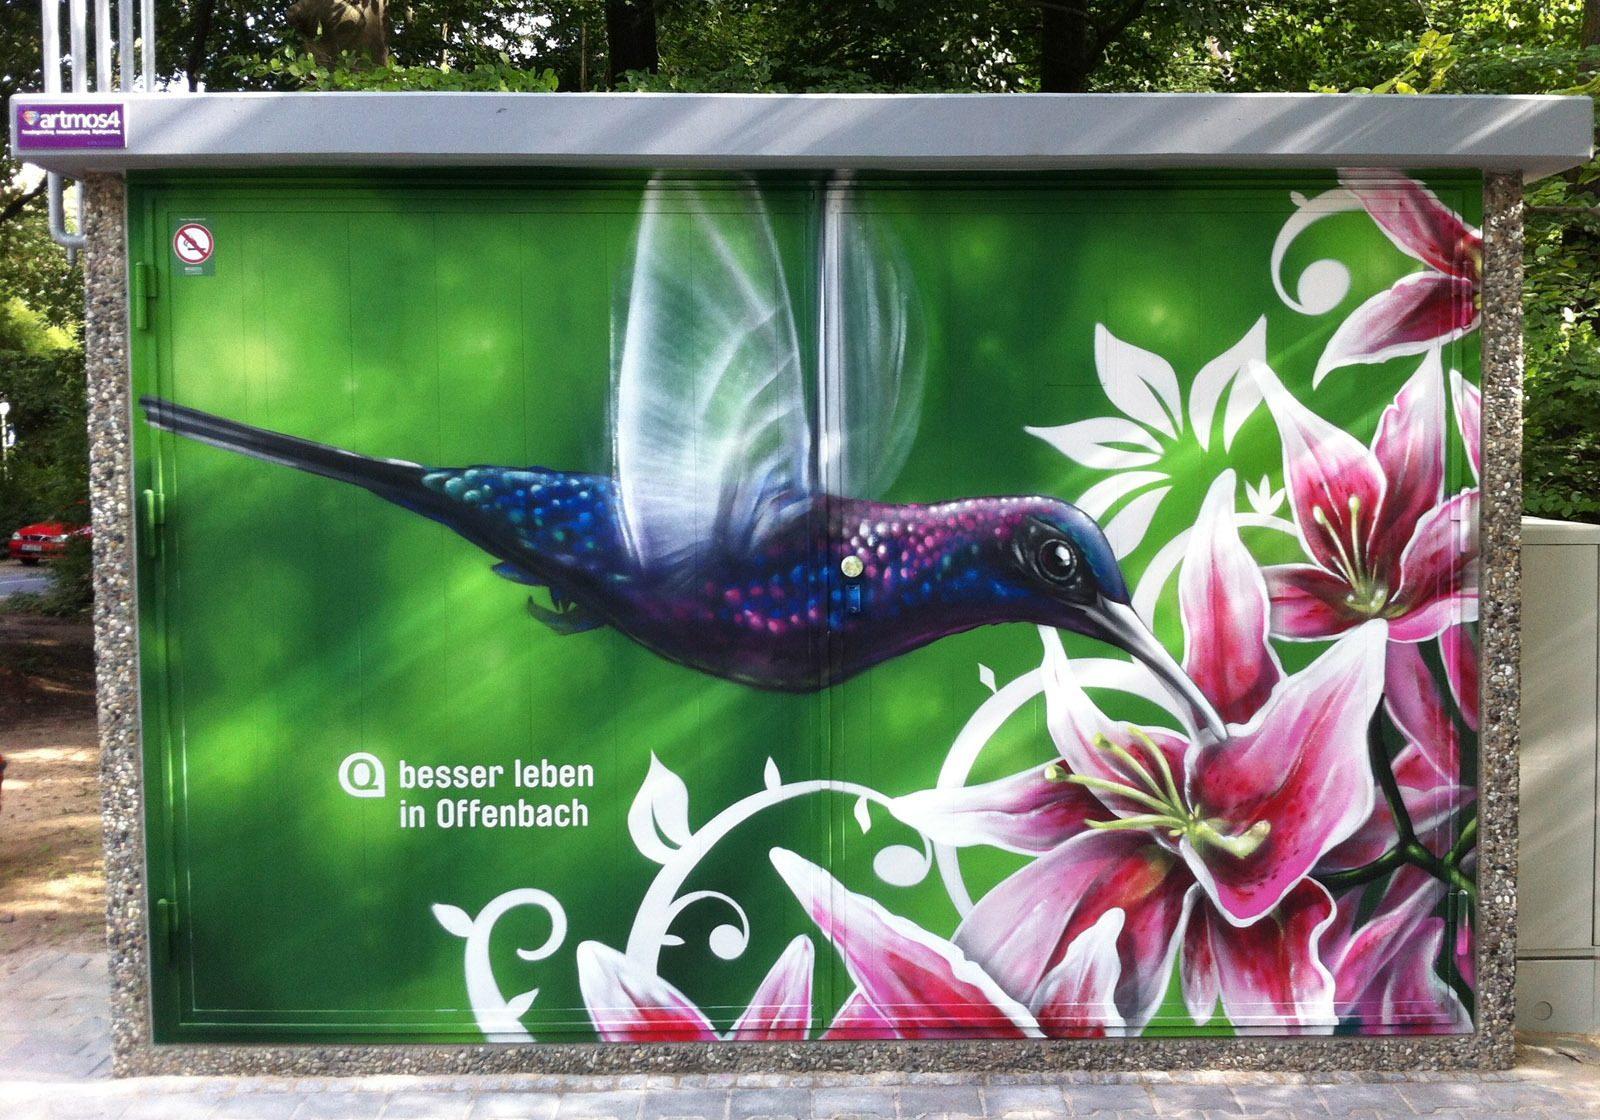 graffitikuenstler-graffitiauftrag-artmos4-energieversorger-offenbach-tier-pflanzen-bunt